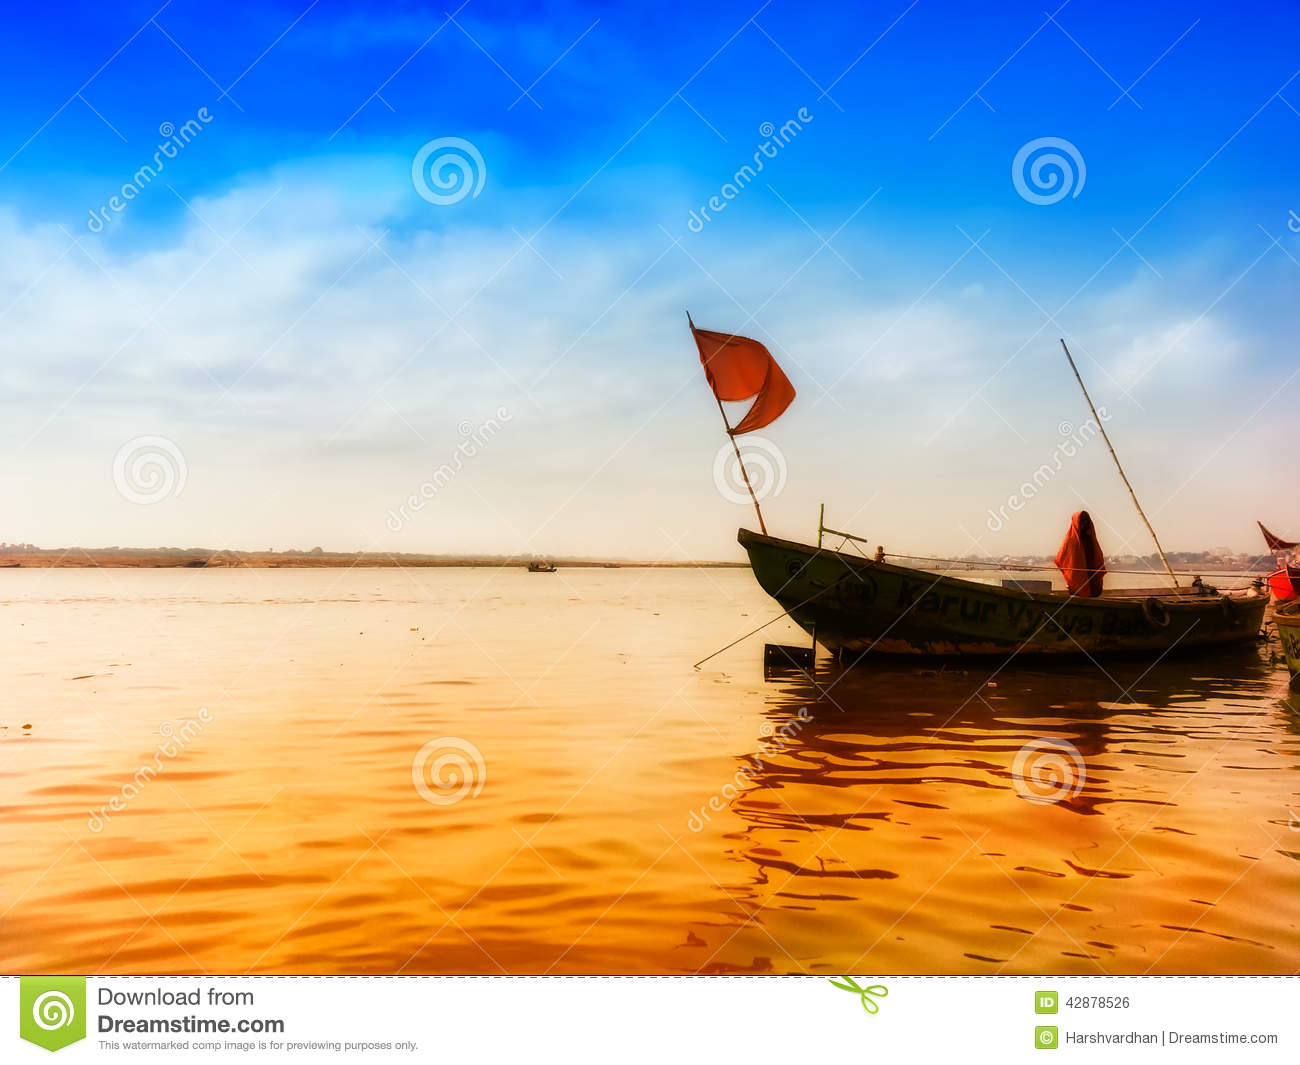 Ganga river clipart graphic freeuse Ganga clip art - ClipartFest graphic freeuse